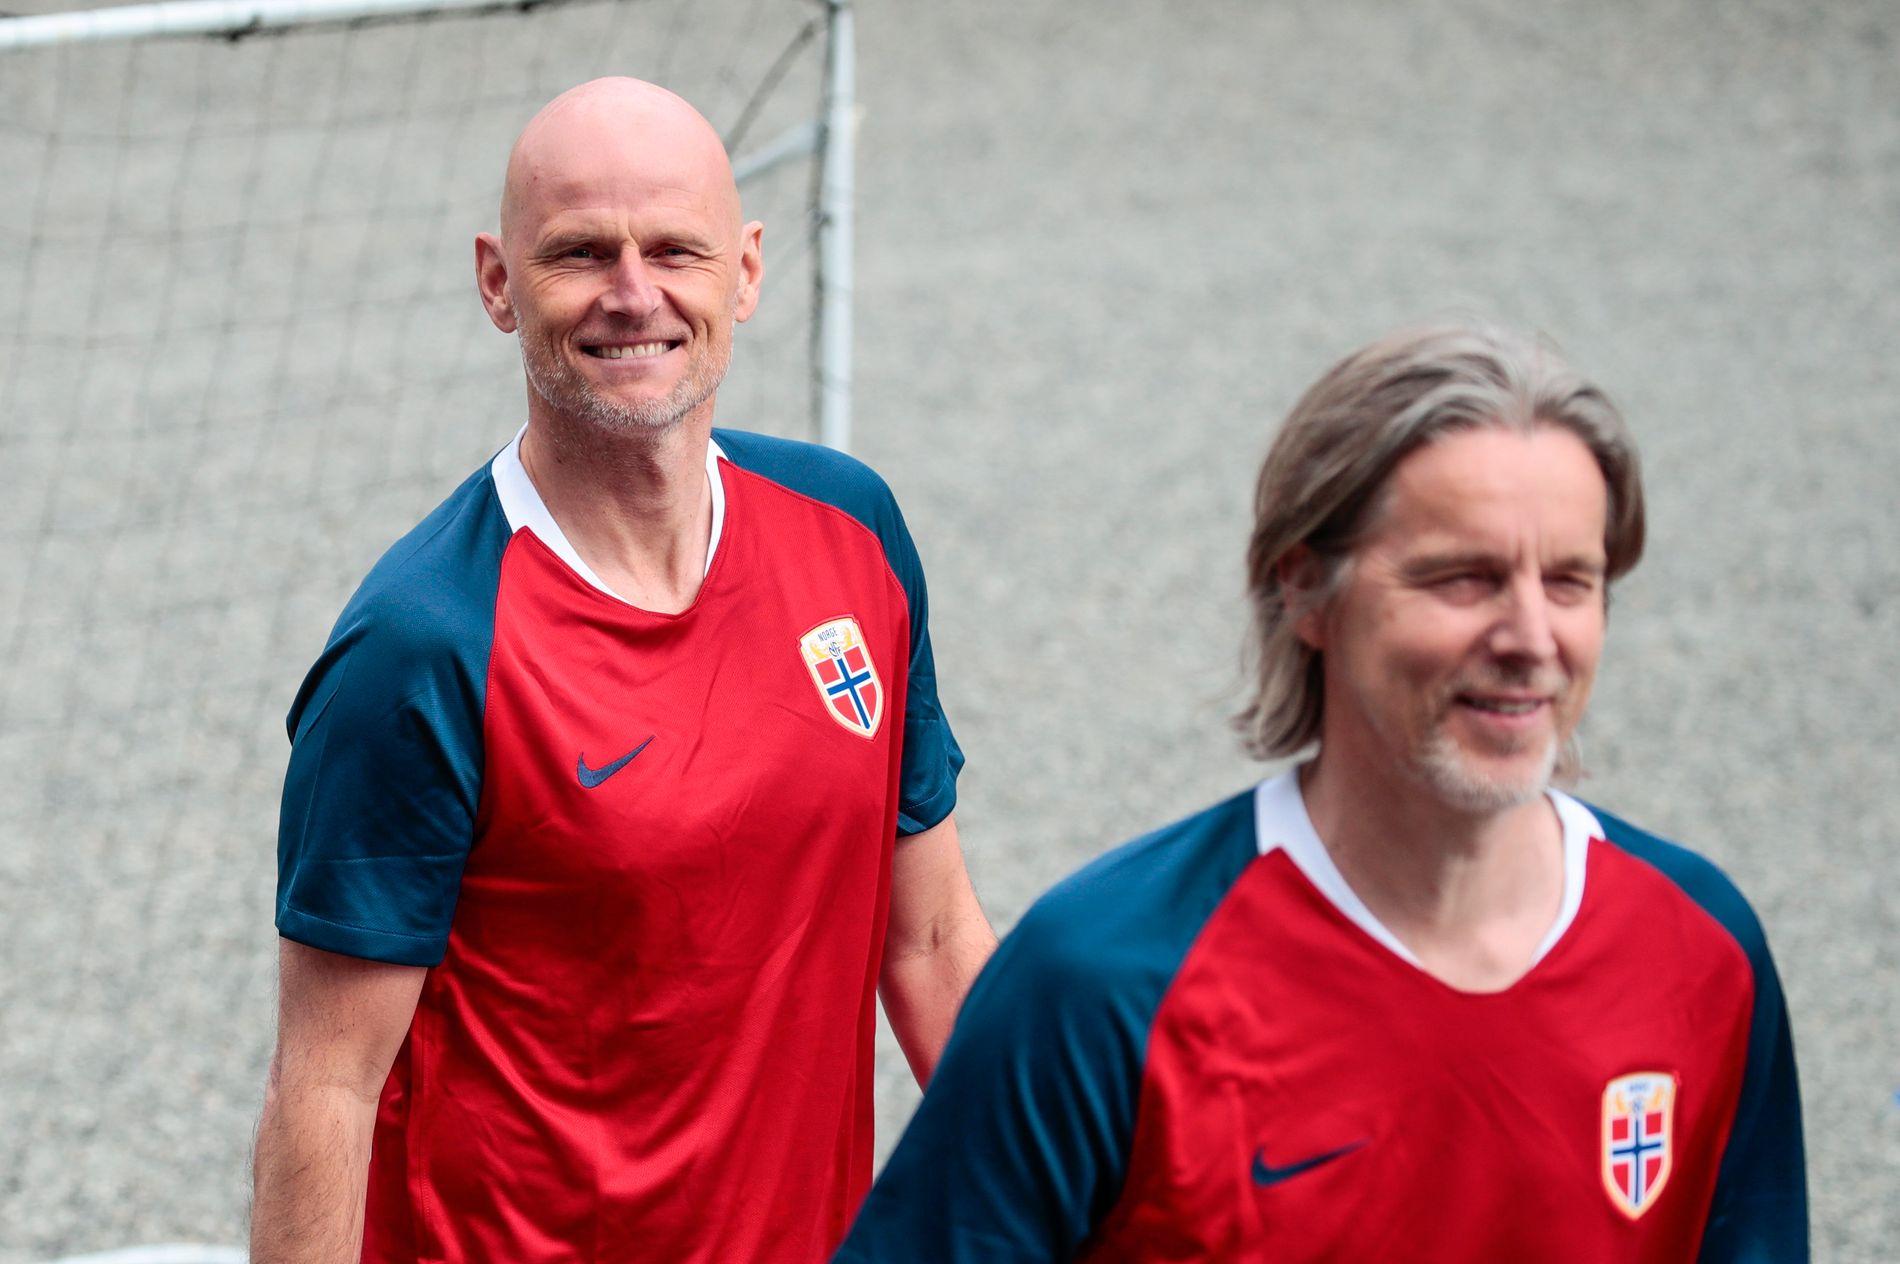 MED LANDSLAGSDRAKT IGJEN: Ståle Solbakken sammen med tidligere landslagskamerat Jan Åge Fjørtoft på den årlige vennskapskampen med kronprinsparet på Skaugum.